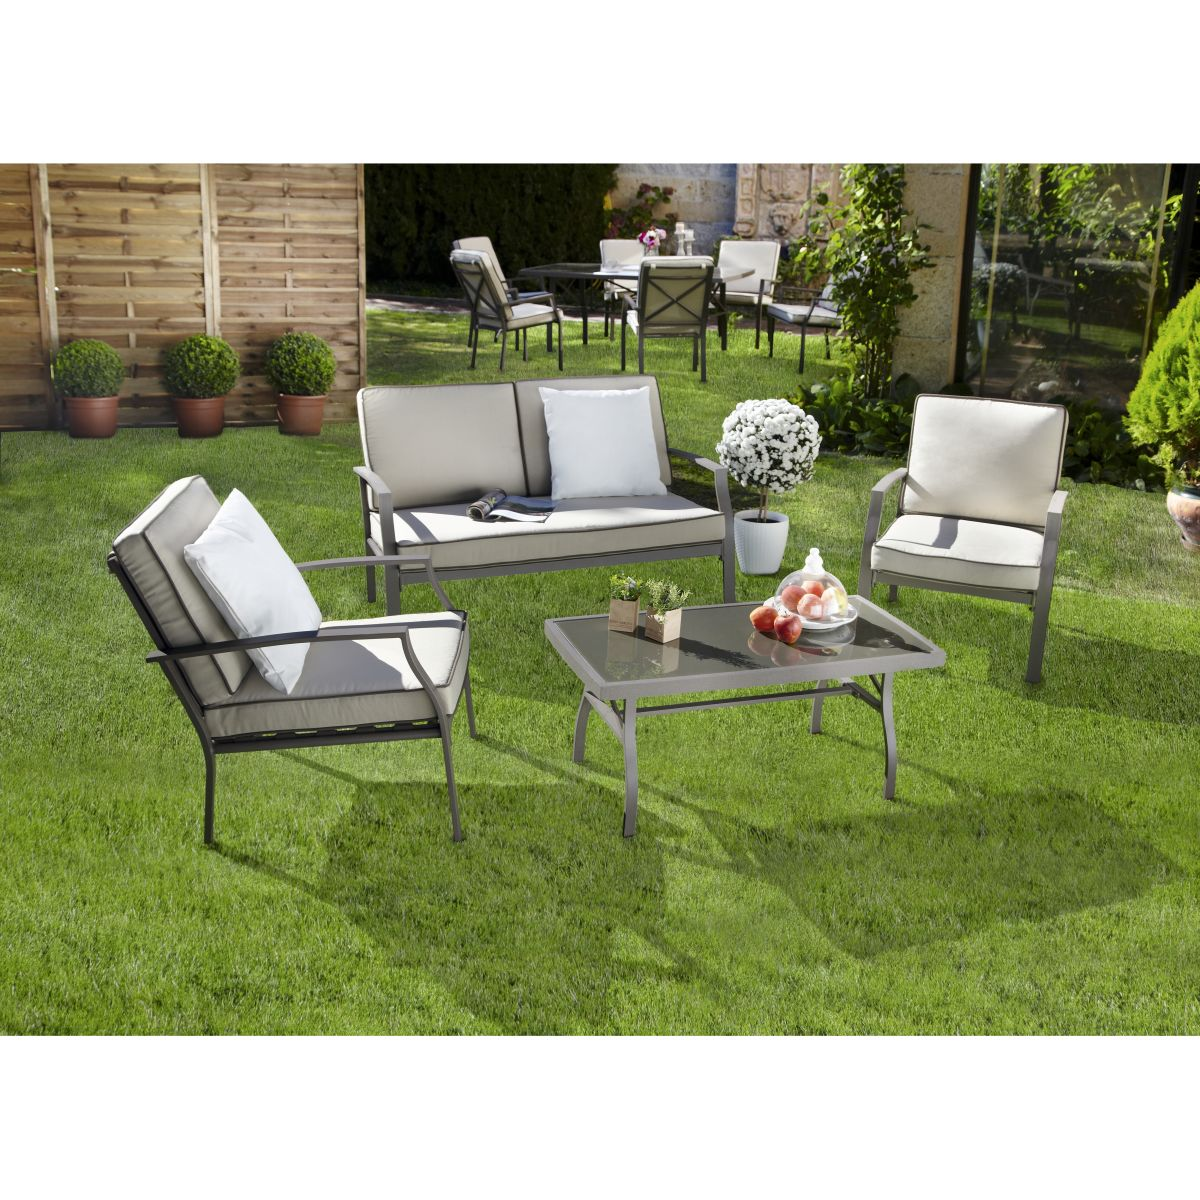 Best tavolo giardino usato gallery for Offerte tavoli e sedie da esterno